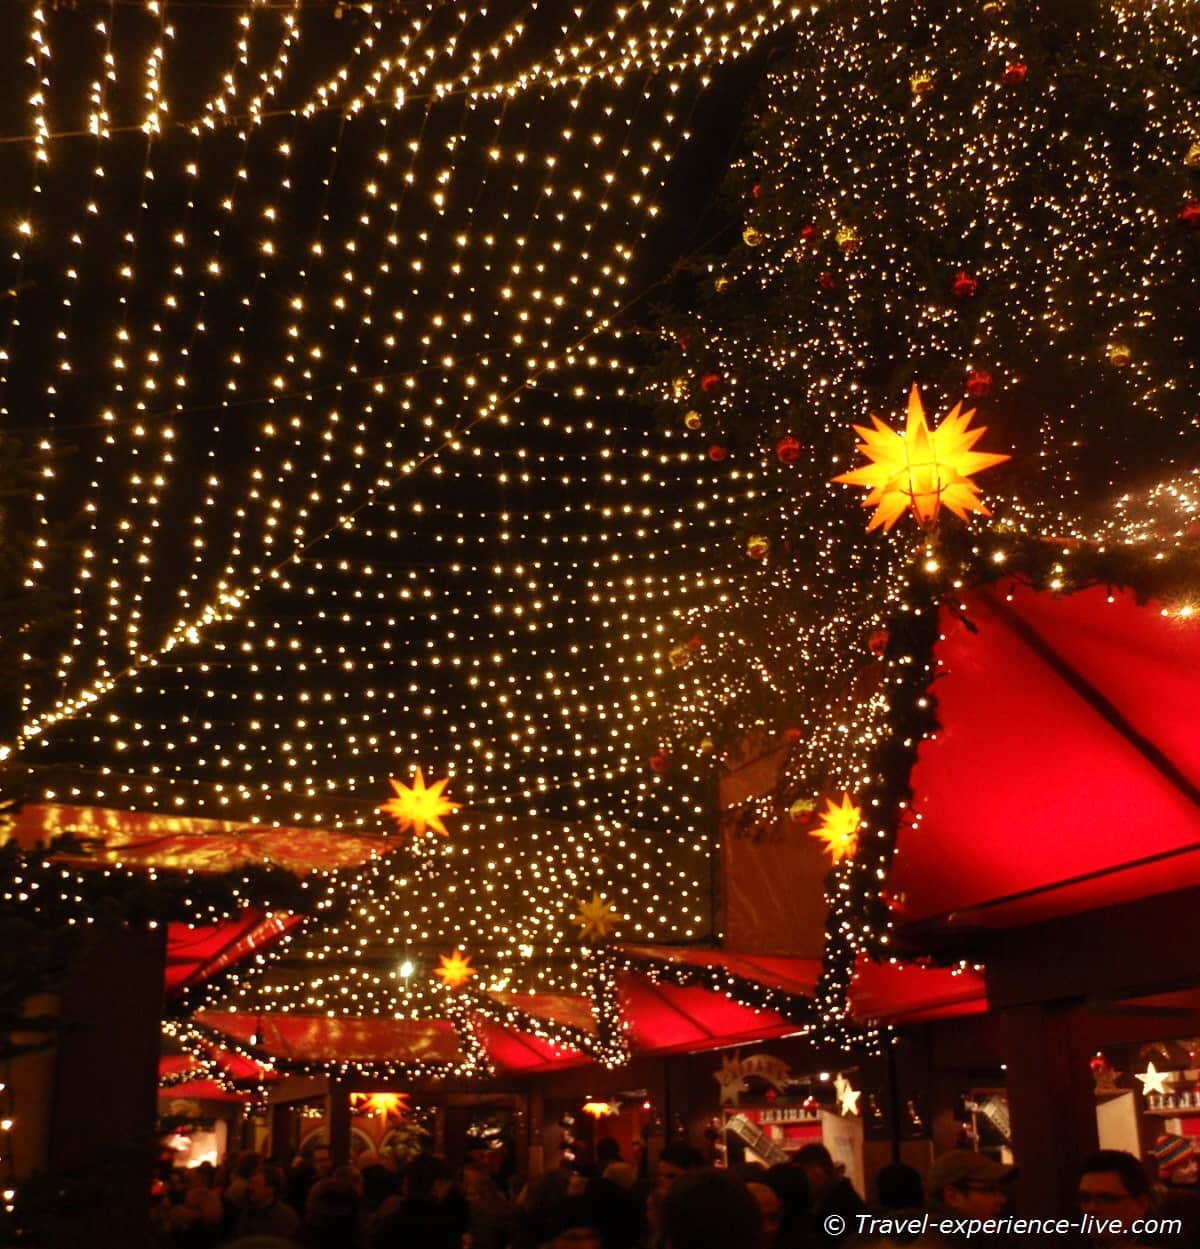 Europe's Christmas Markets